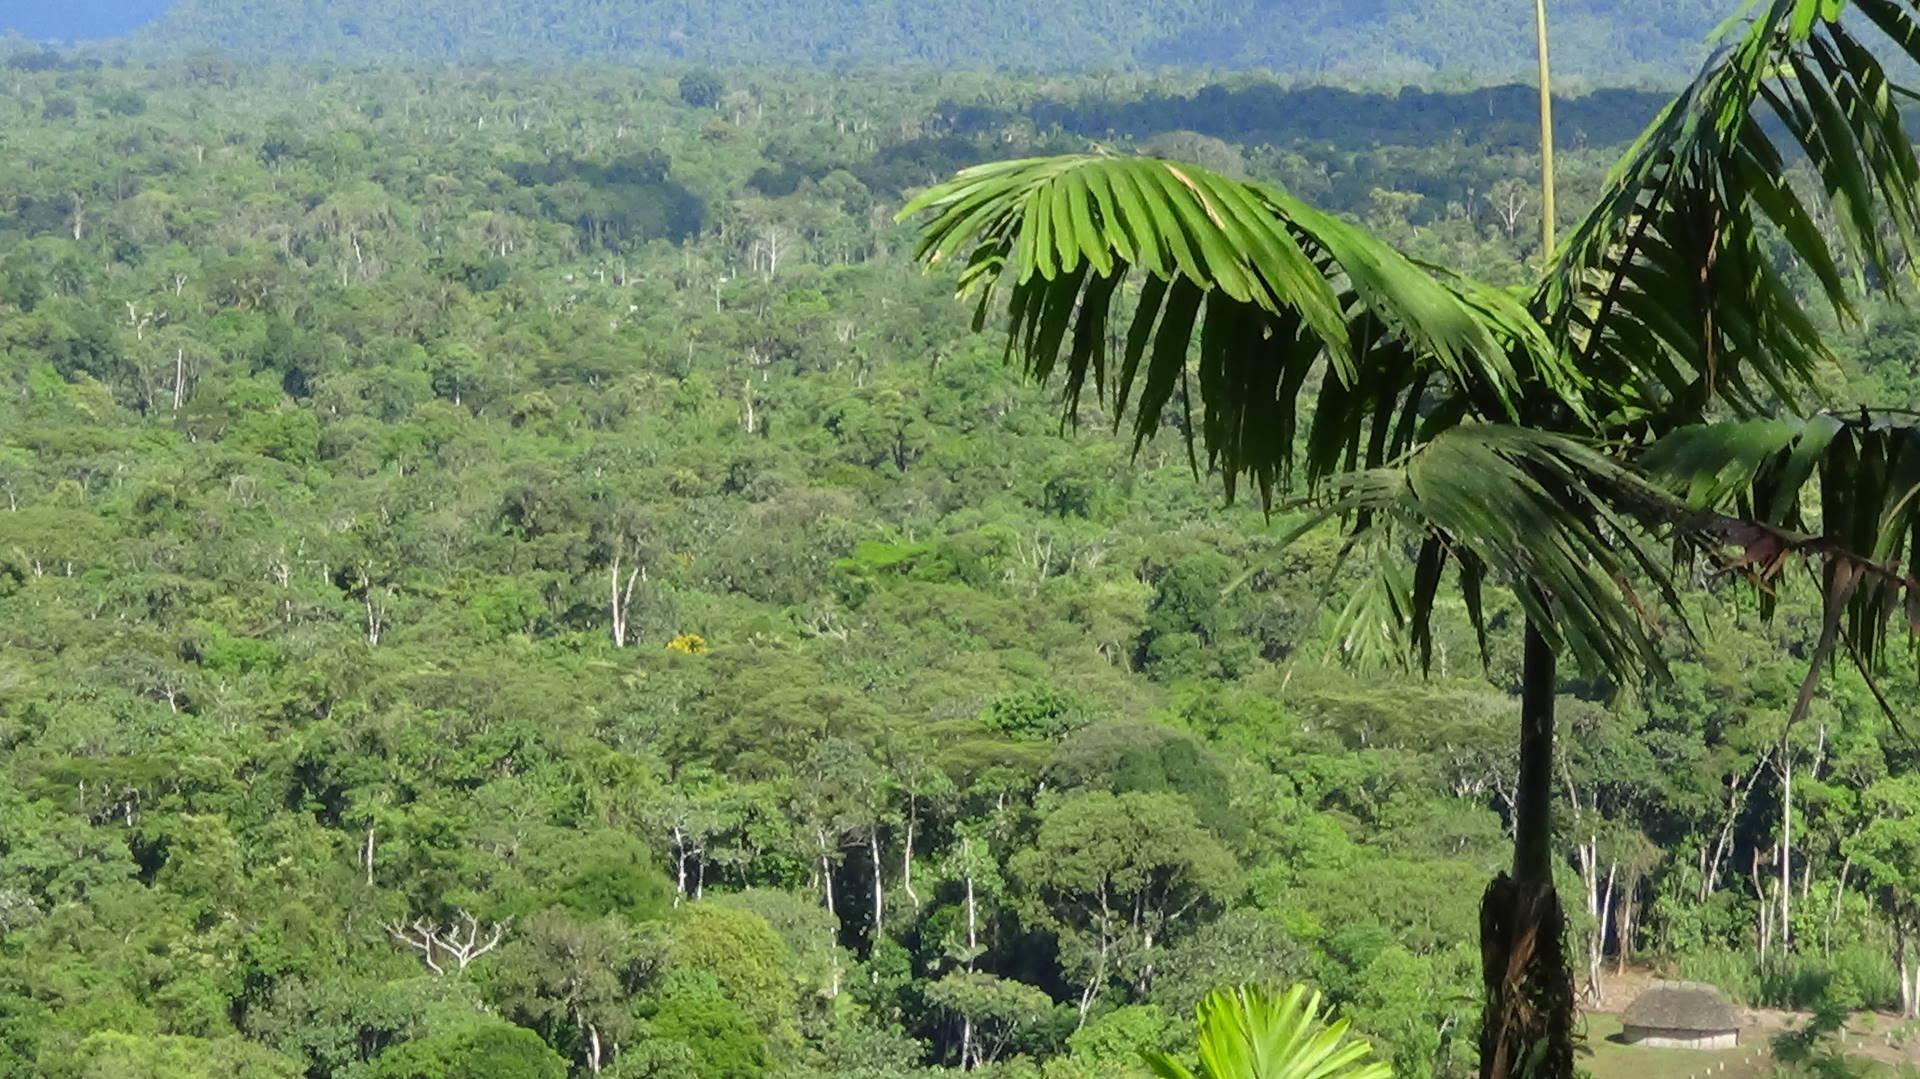 Rainforest top-view